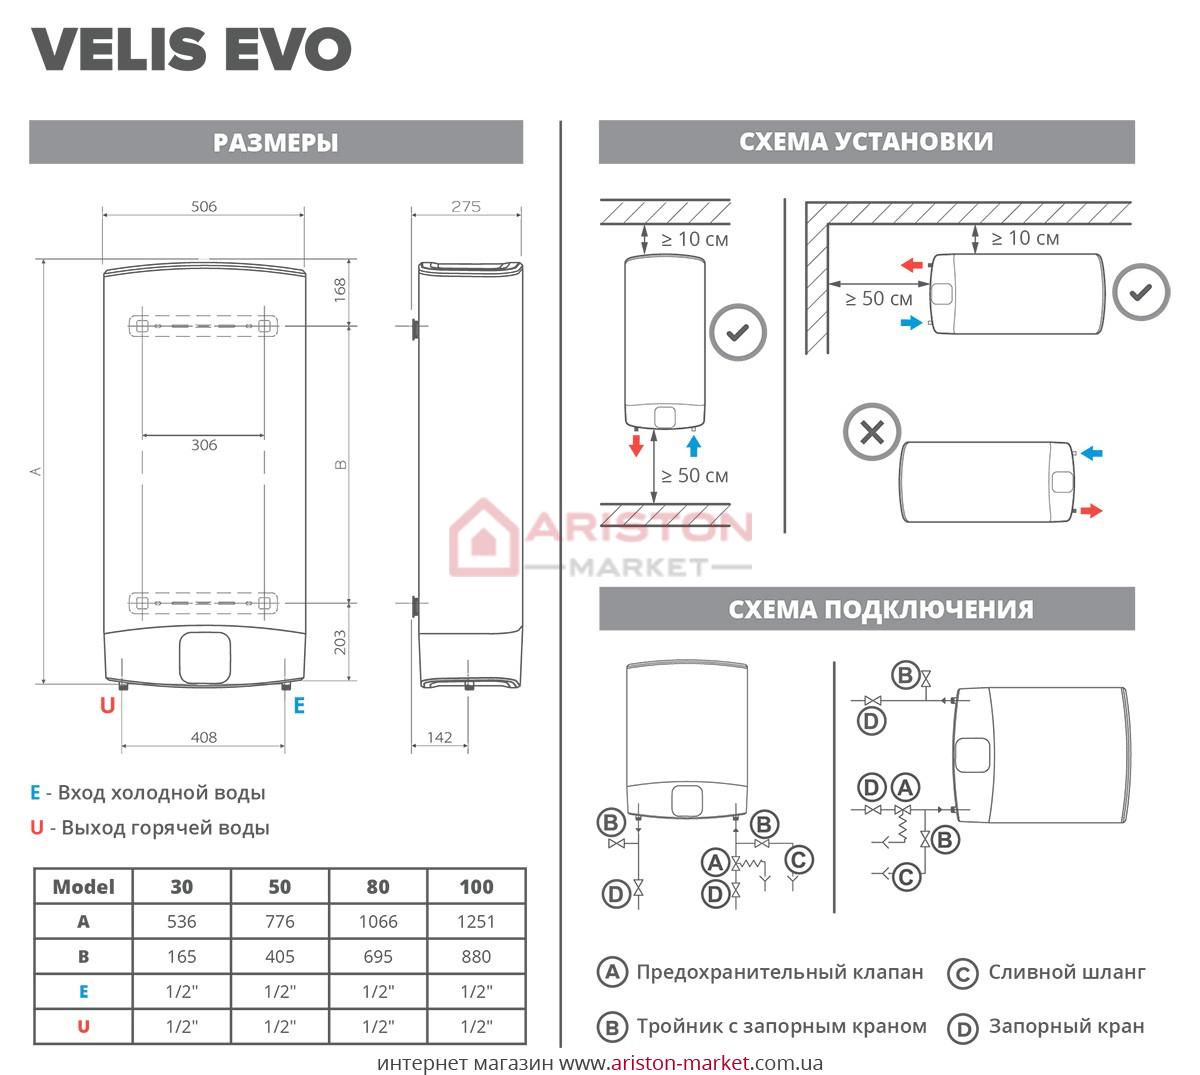 Ariston ABS Velis Evo Power 50 D схема, габариты, чертеж